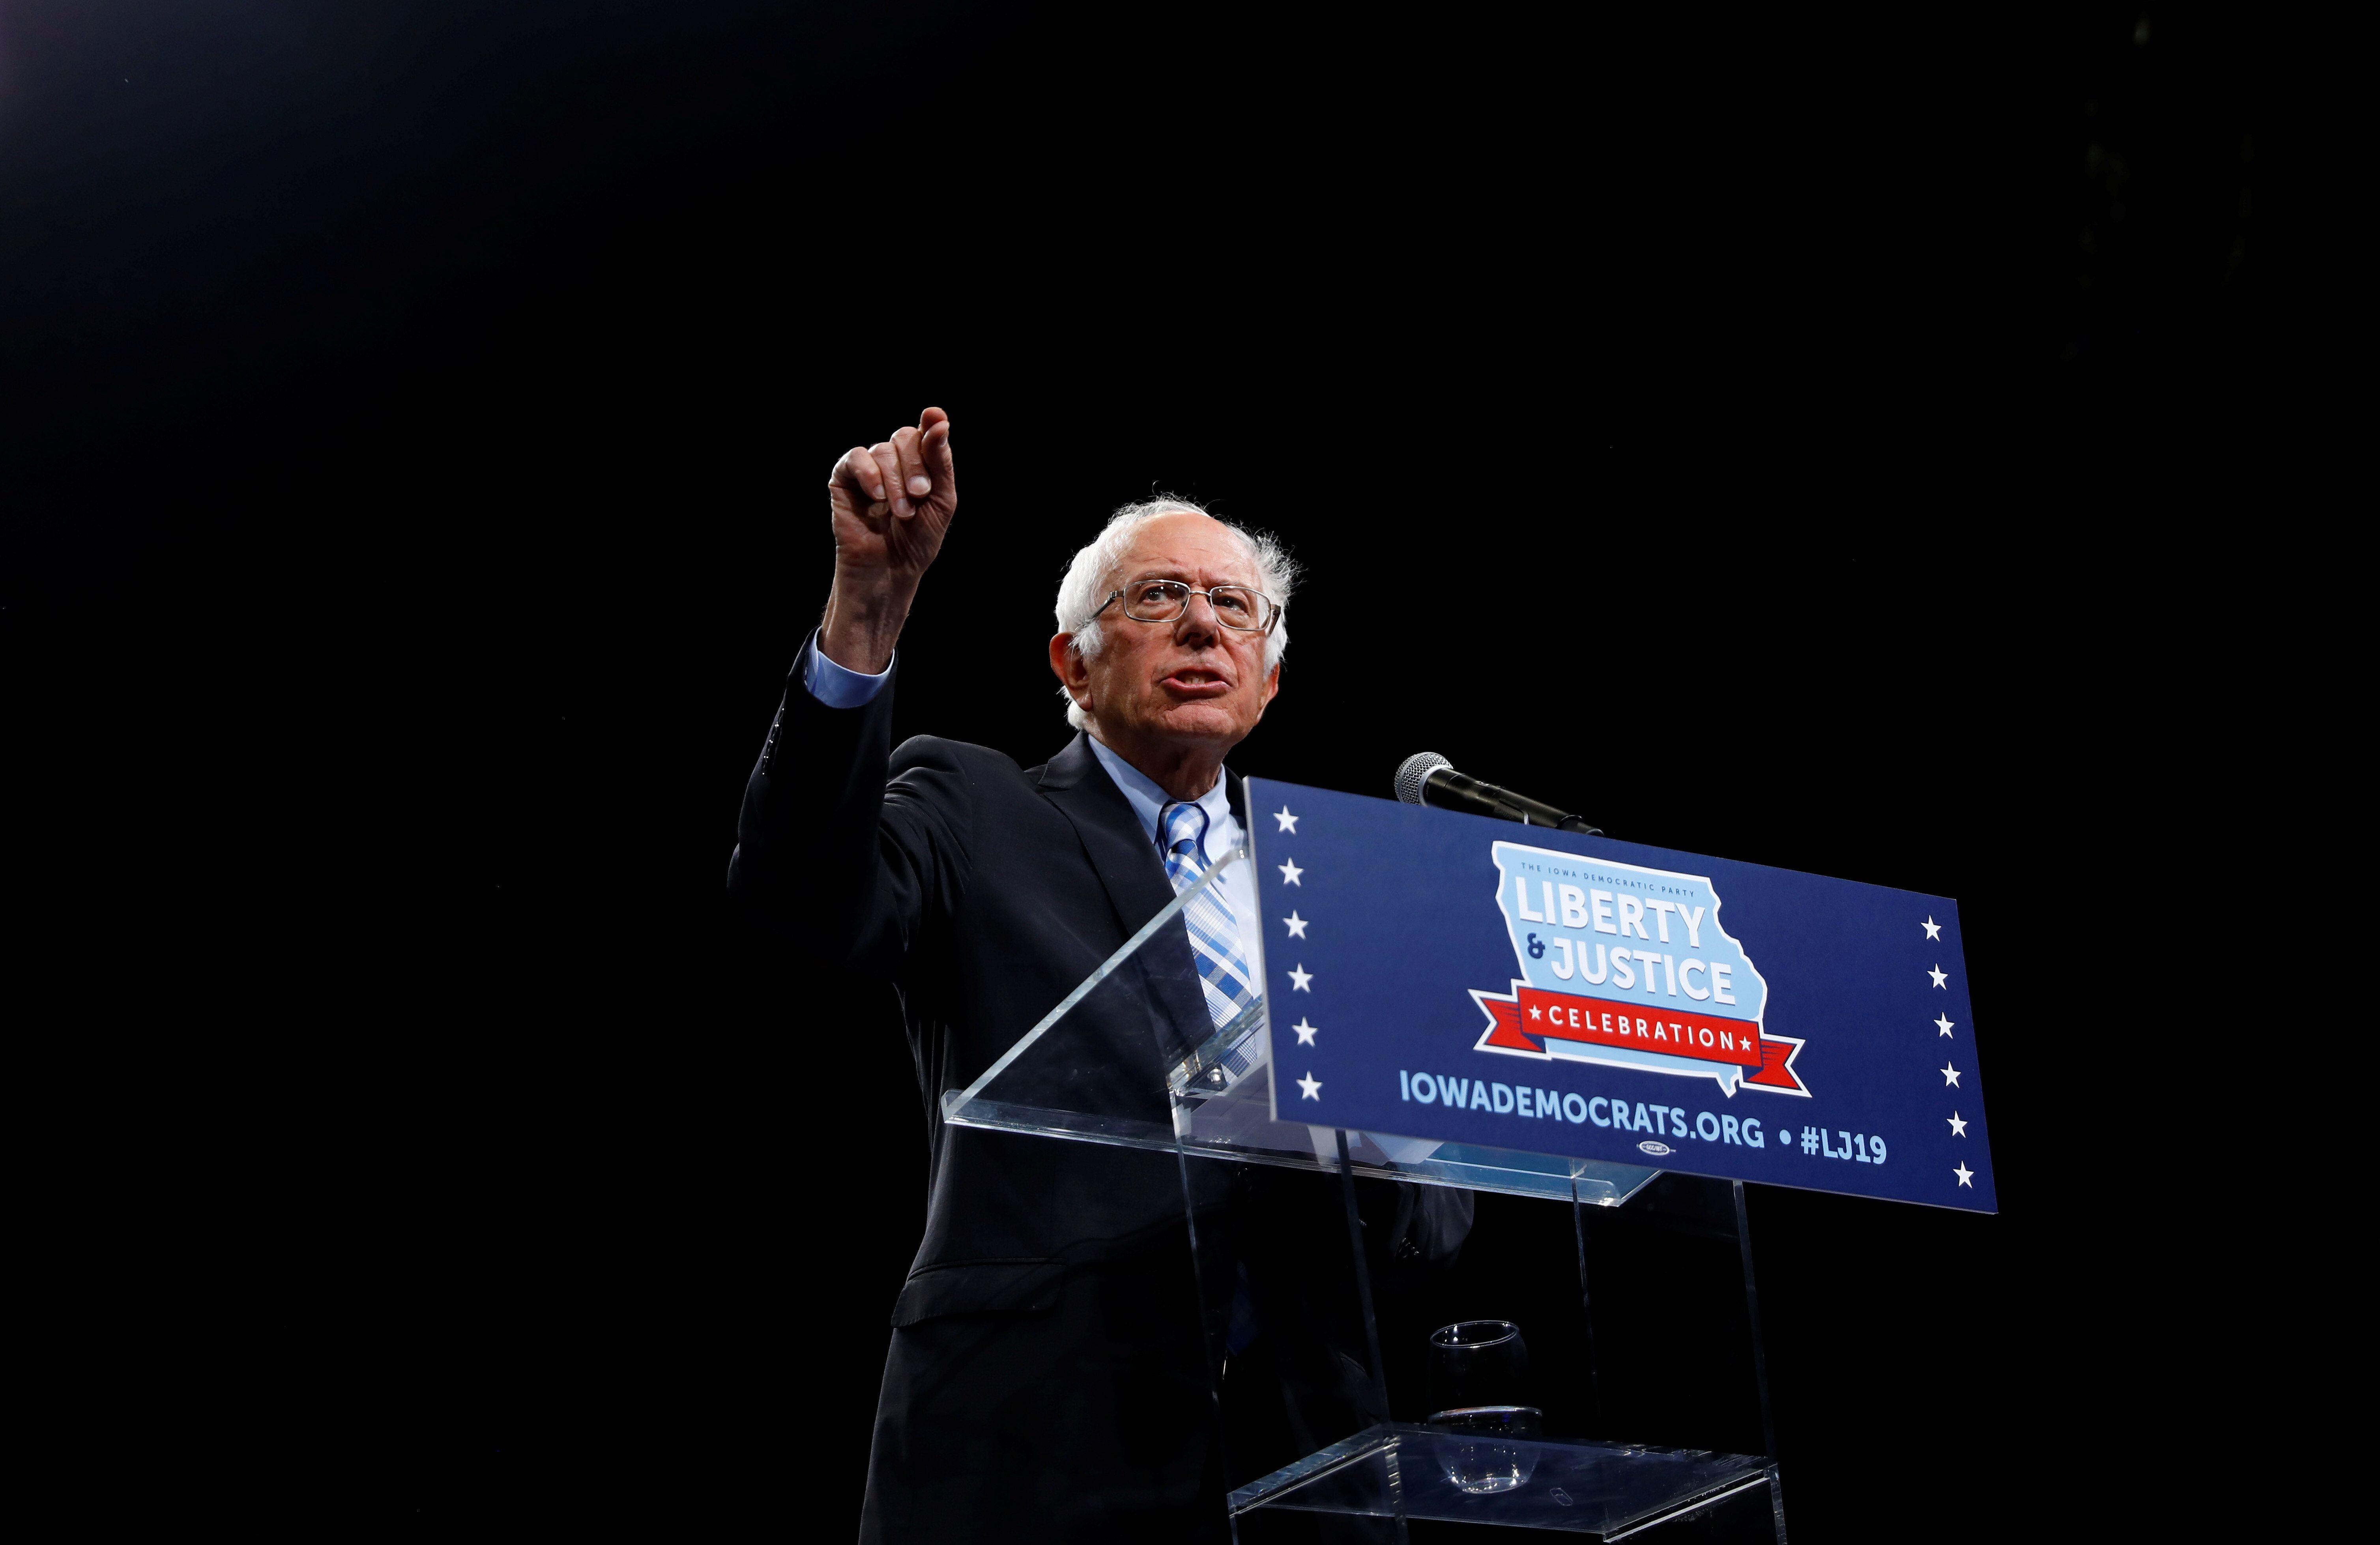 Democratic 2020 U.S. presidential candidate Sen. Bernie Sanders speaks at a Democratic Party fundraising dinner in Des Moines